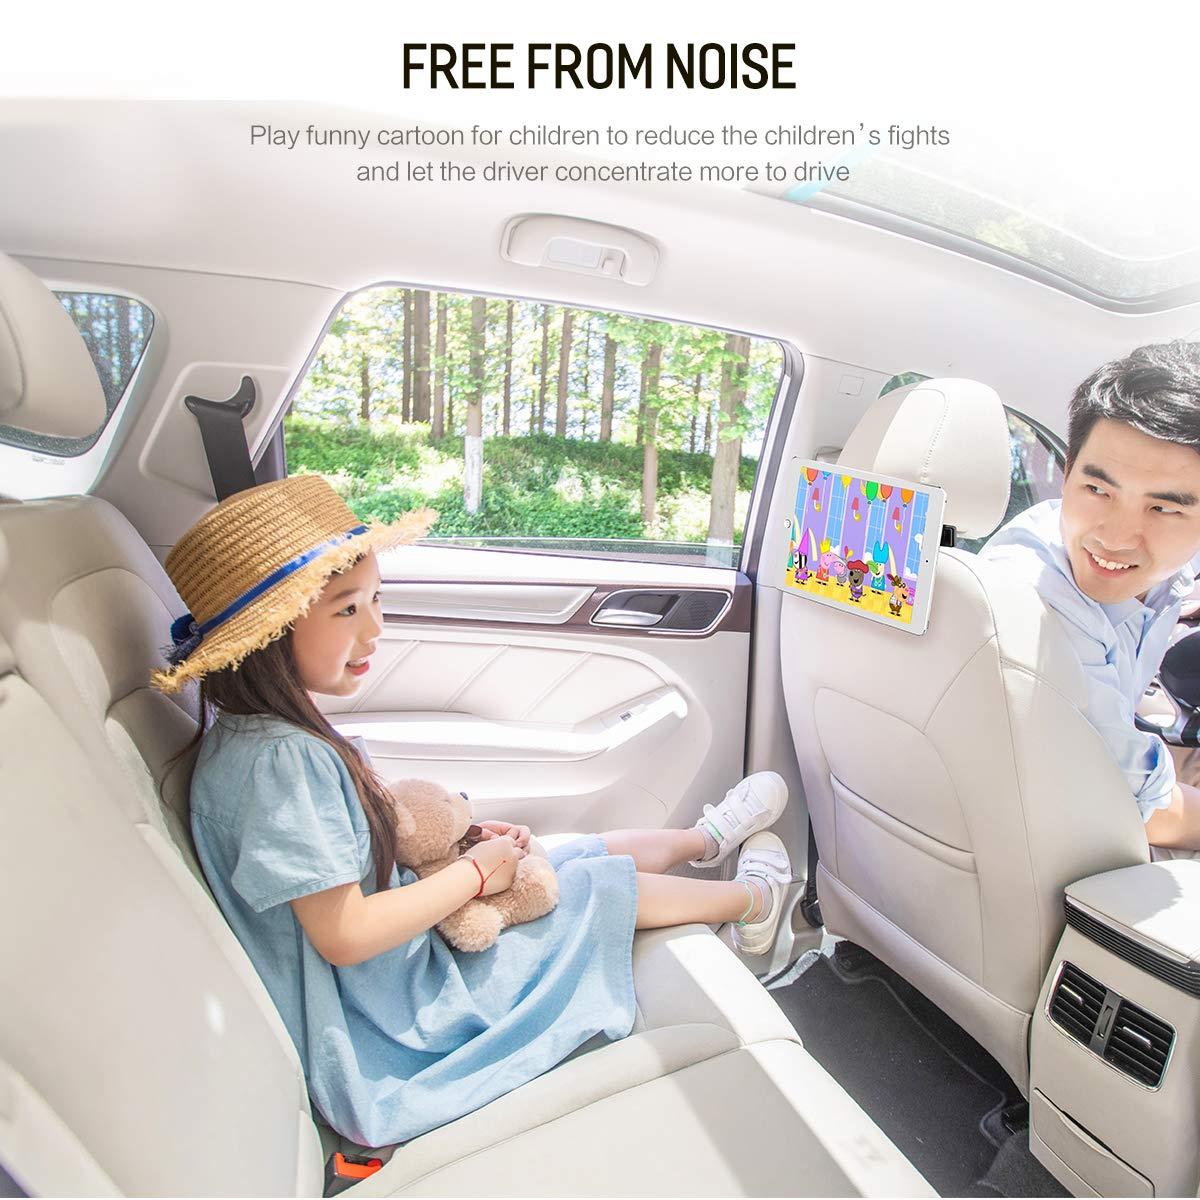 Purse hook for car headrest,Car Headrest Hook,Headrest Hooks for Car,Back Seat Car Hooks for Purse or Grocery Bags,Tablet Holder Headrest Hanger,Back Seat Car Cell Phone Holder Organizer Blue